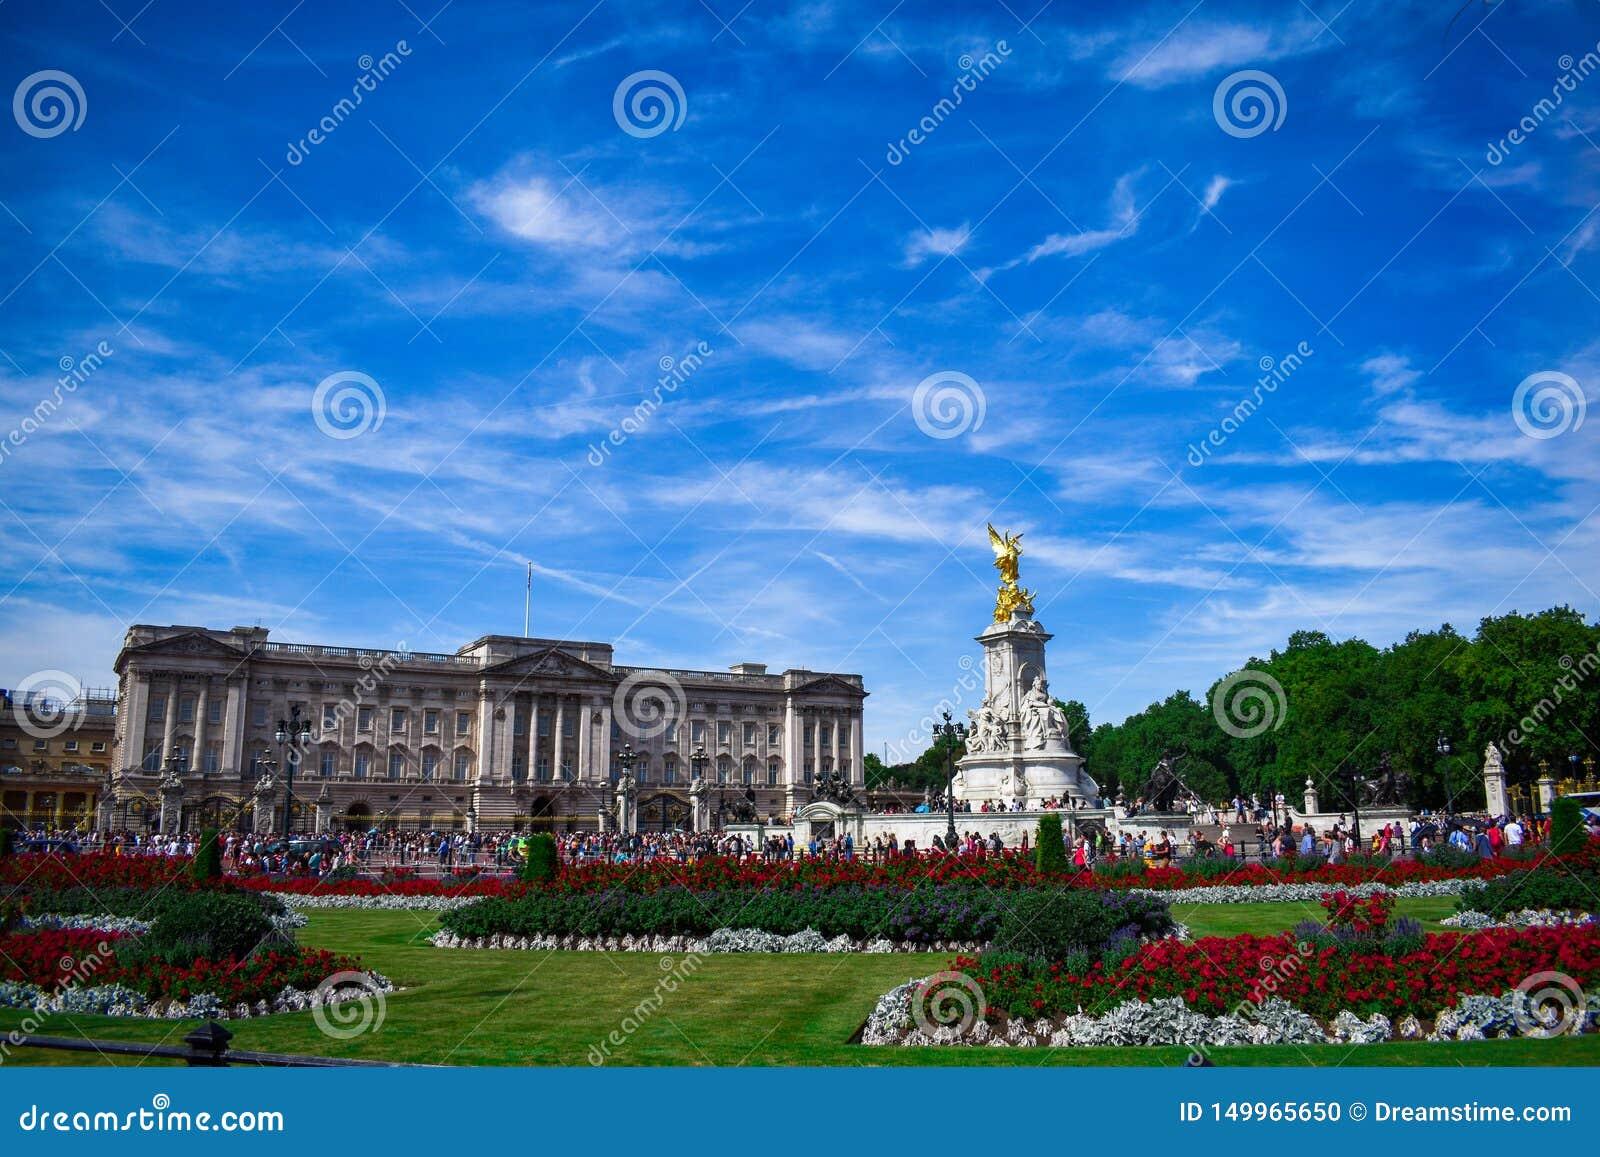 Buckingham Palace με το μνημείο Πλήρης - άποψη του Buckingham Palace κατά τη διάρκεια της ανατολής Παλάτι Buckingham και το μνημε